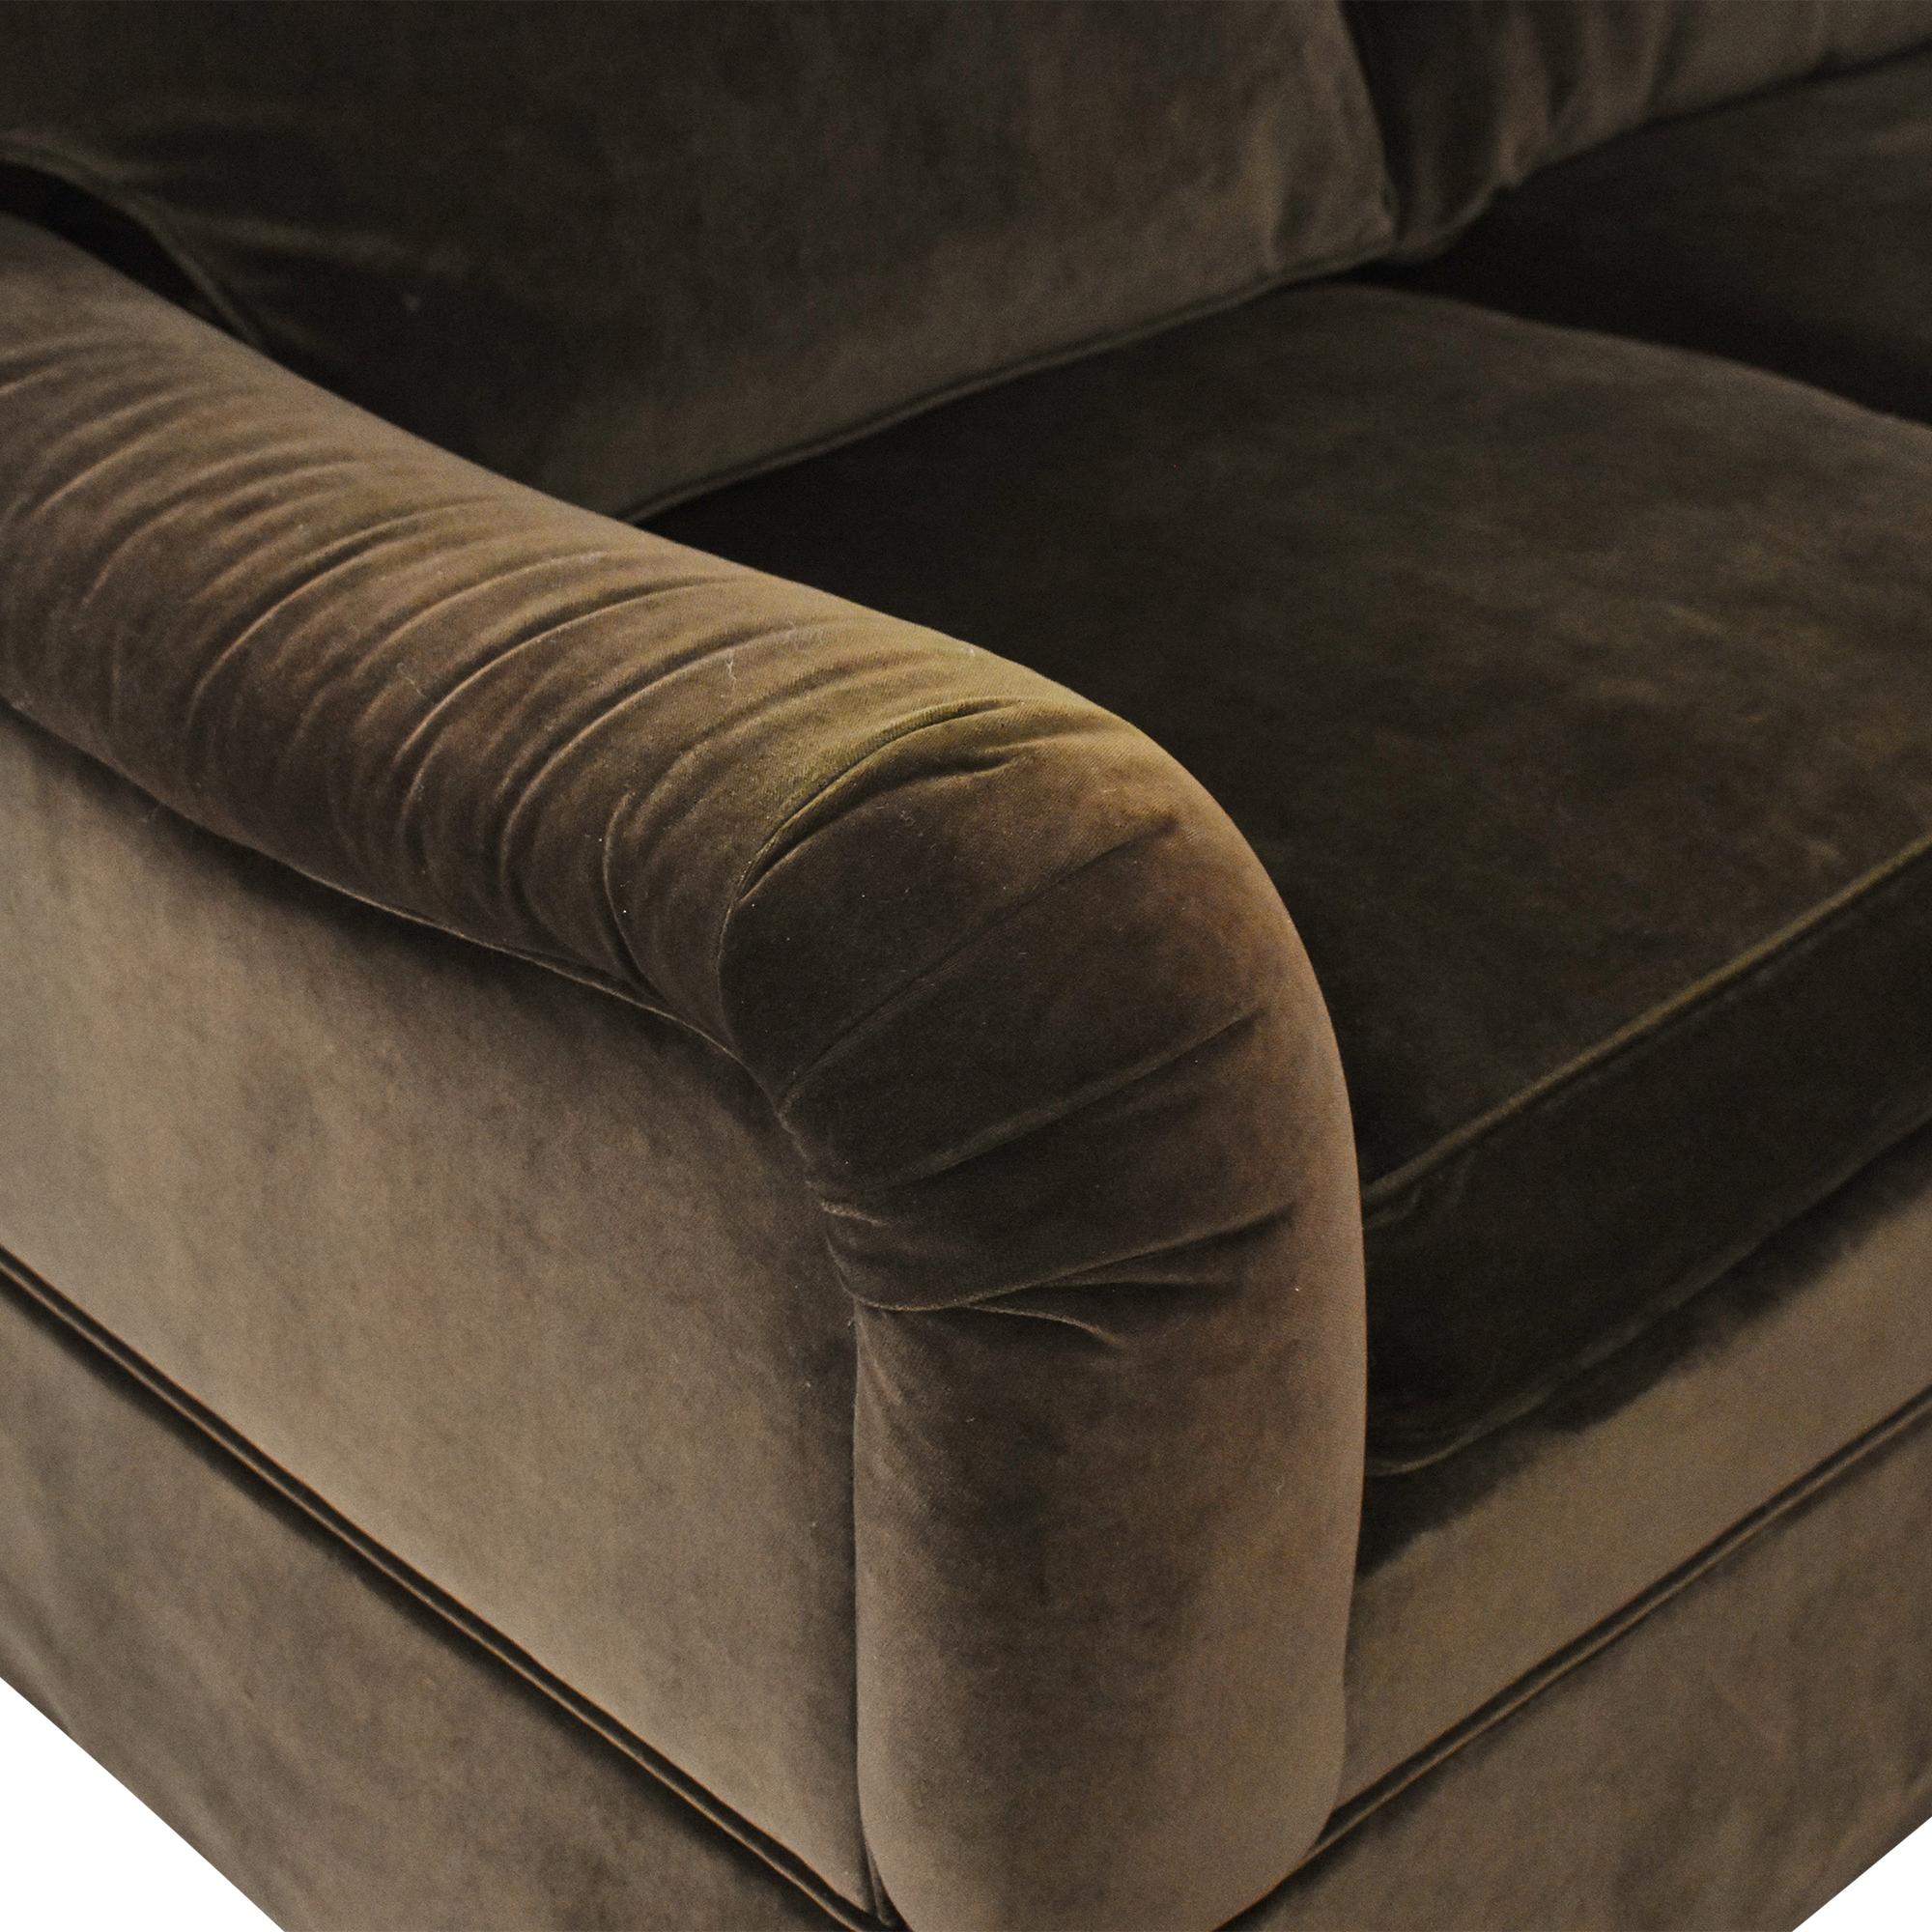 Ethan Allen Ethan Allen L Shaped Sectional Sofa for sale